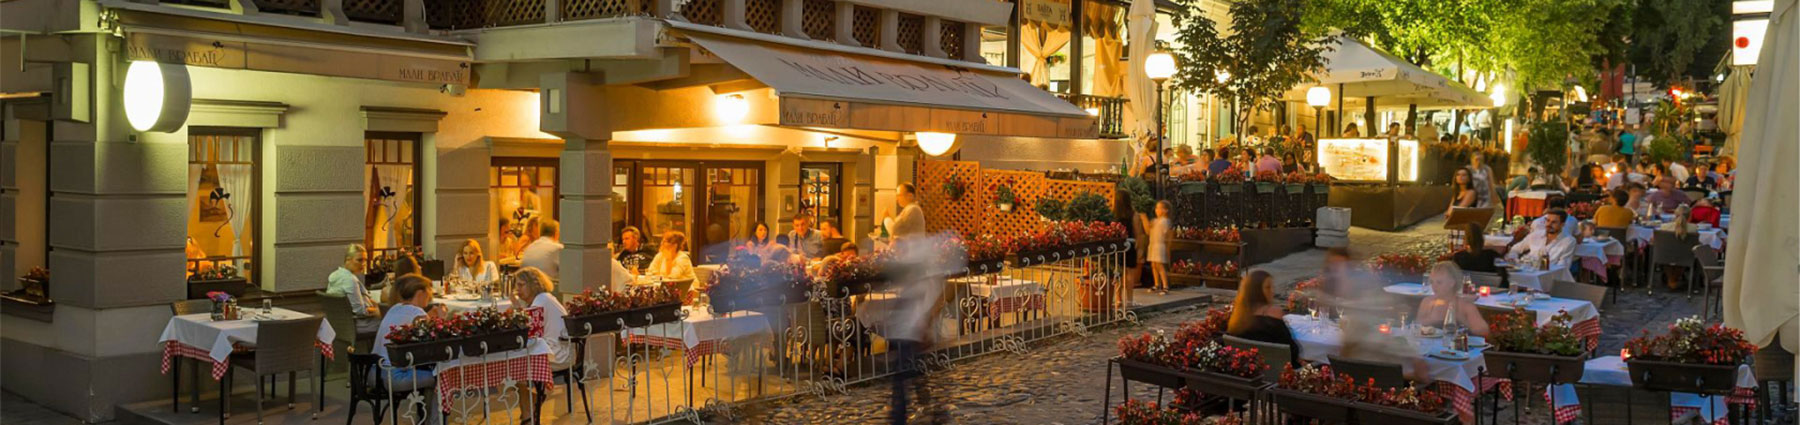 Restaurant Mali Vrabac